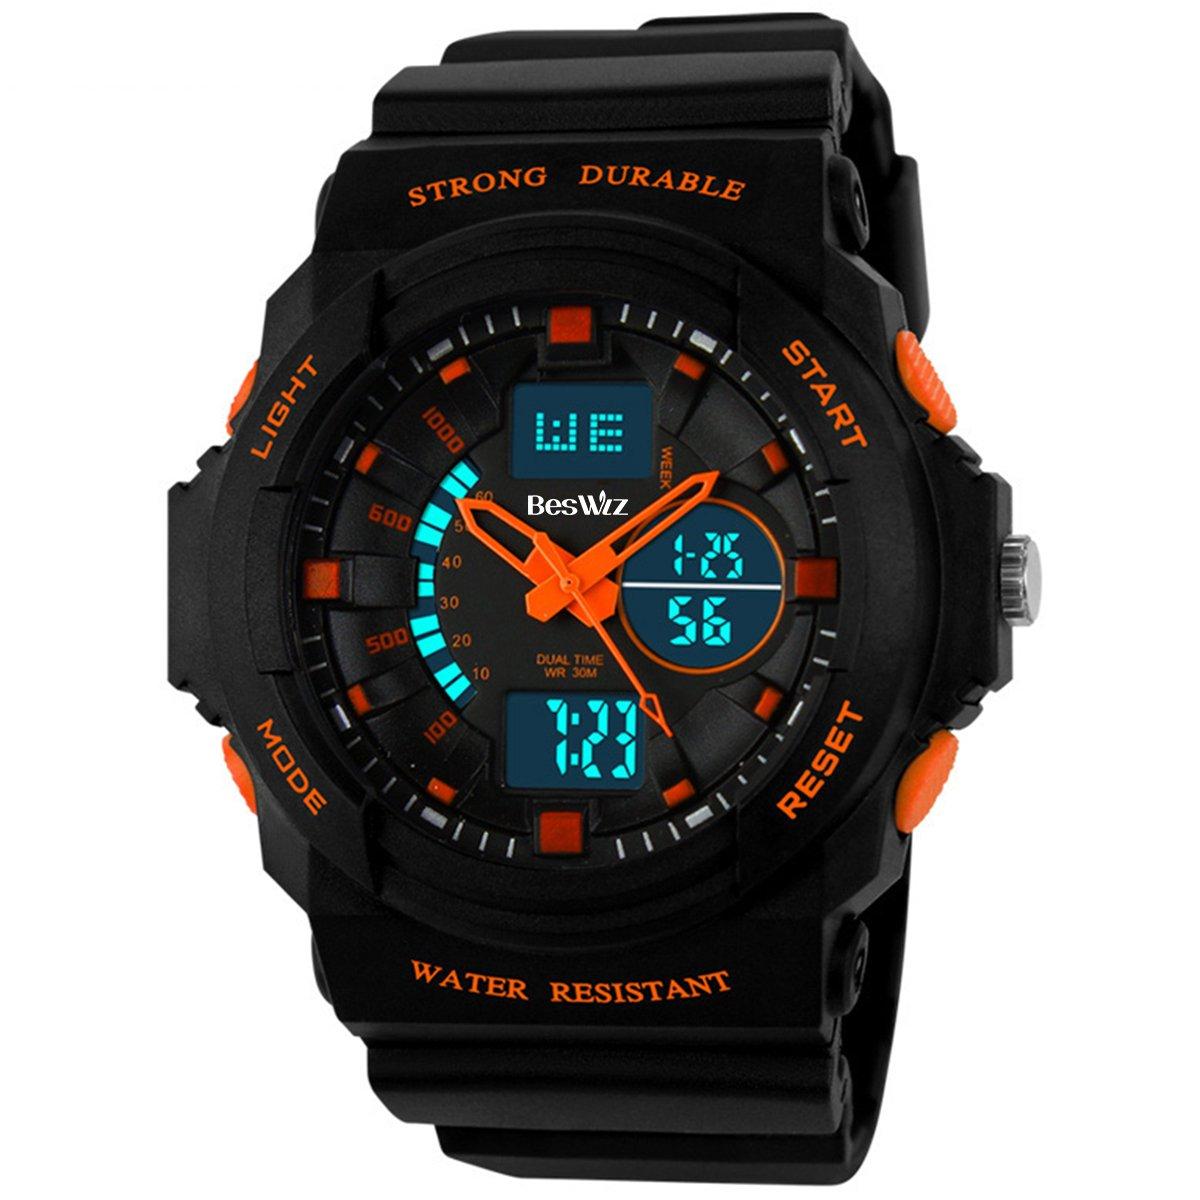 BesWLZ Multi Function Digital LED Quartz Watch Water Resistant Electronic Sport Watches Child Orange by BesWlz (Image #1)